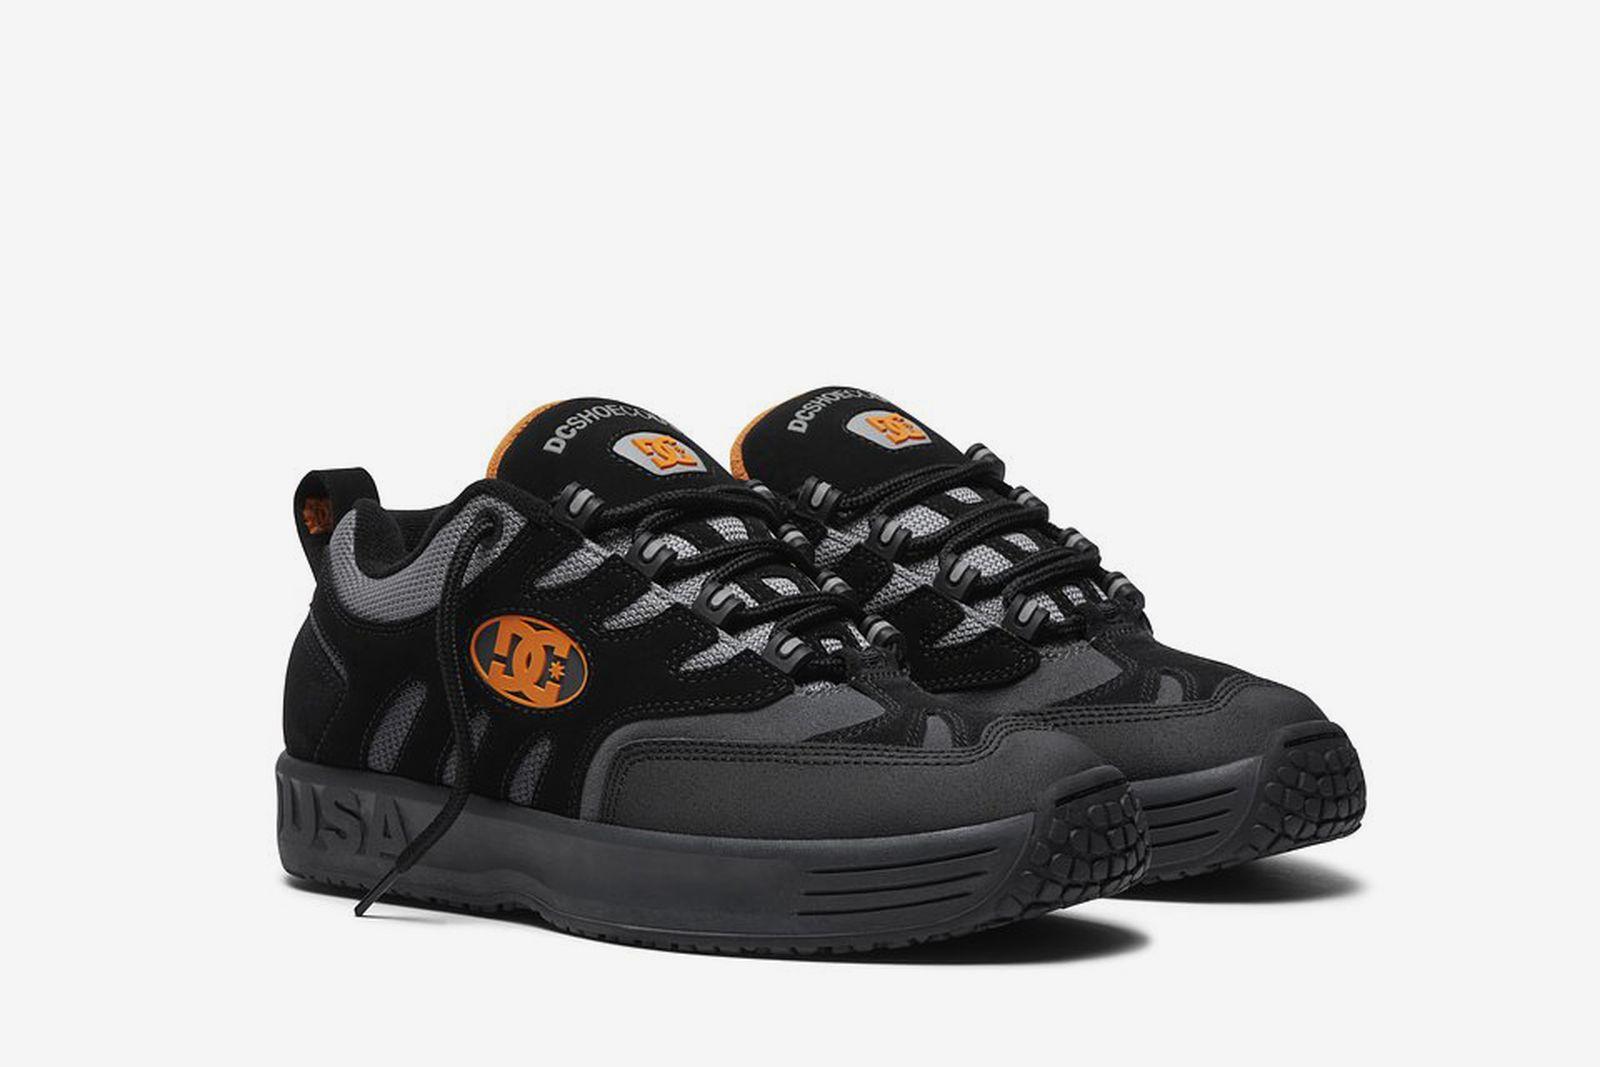 dc-shoes-lukoda-og-black-charcoal-release-date-price-03